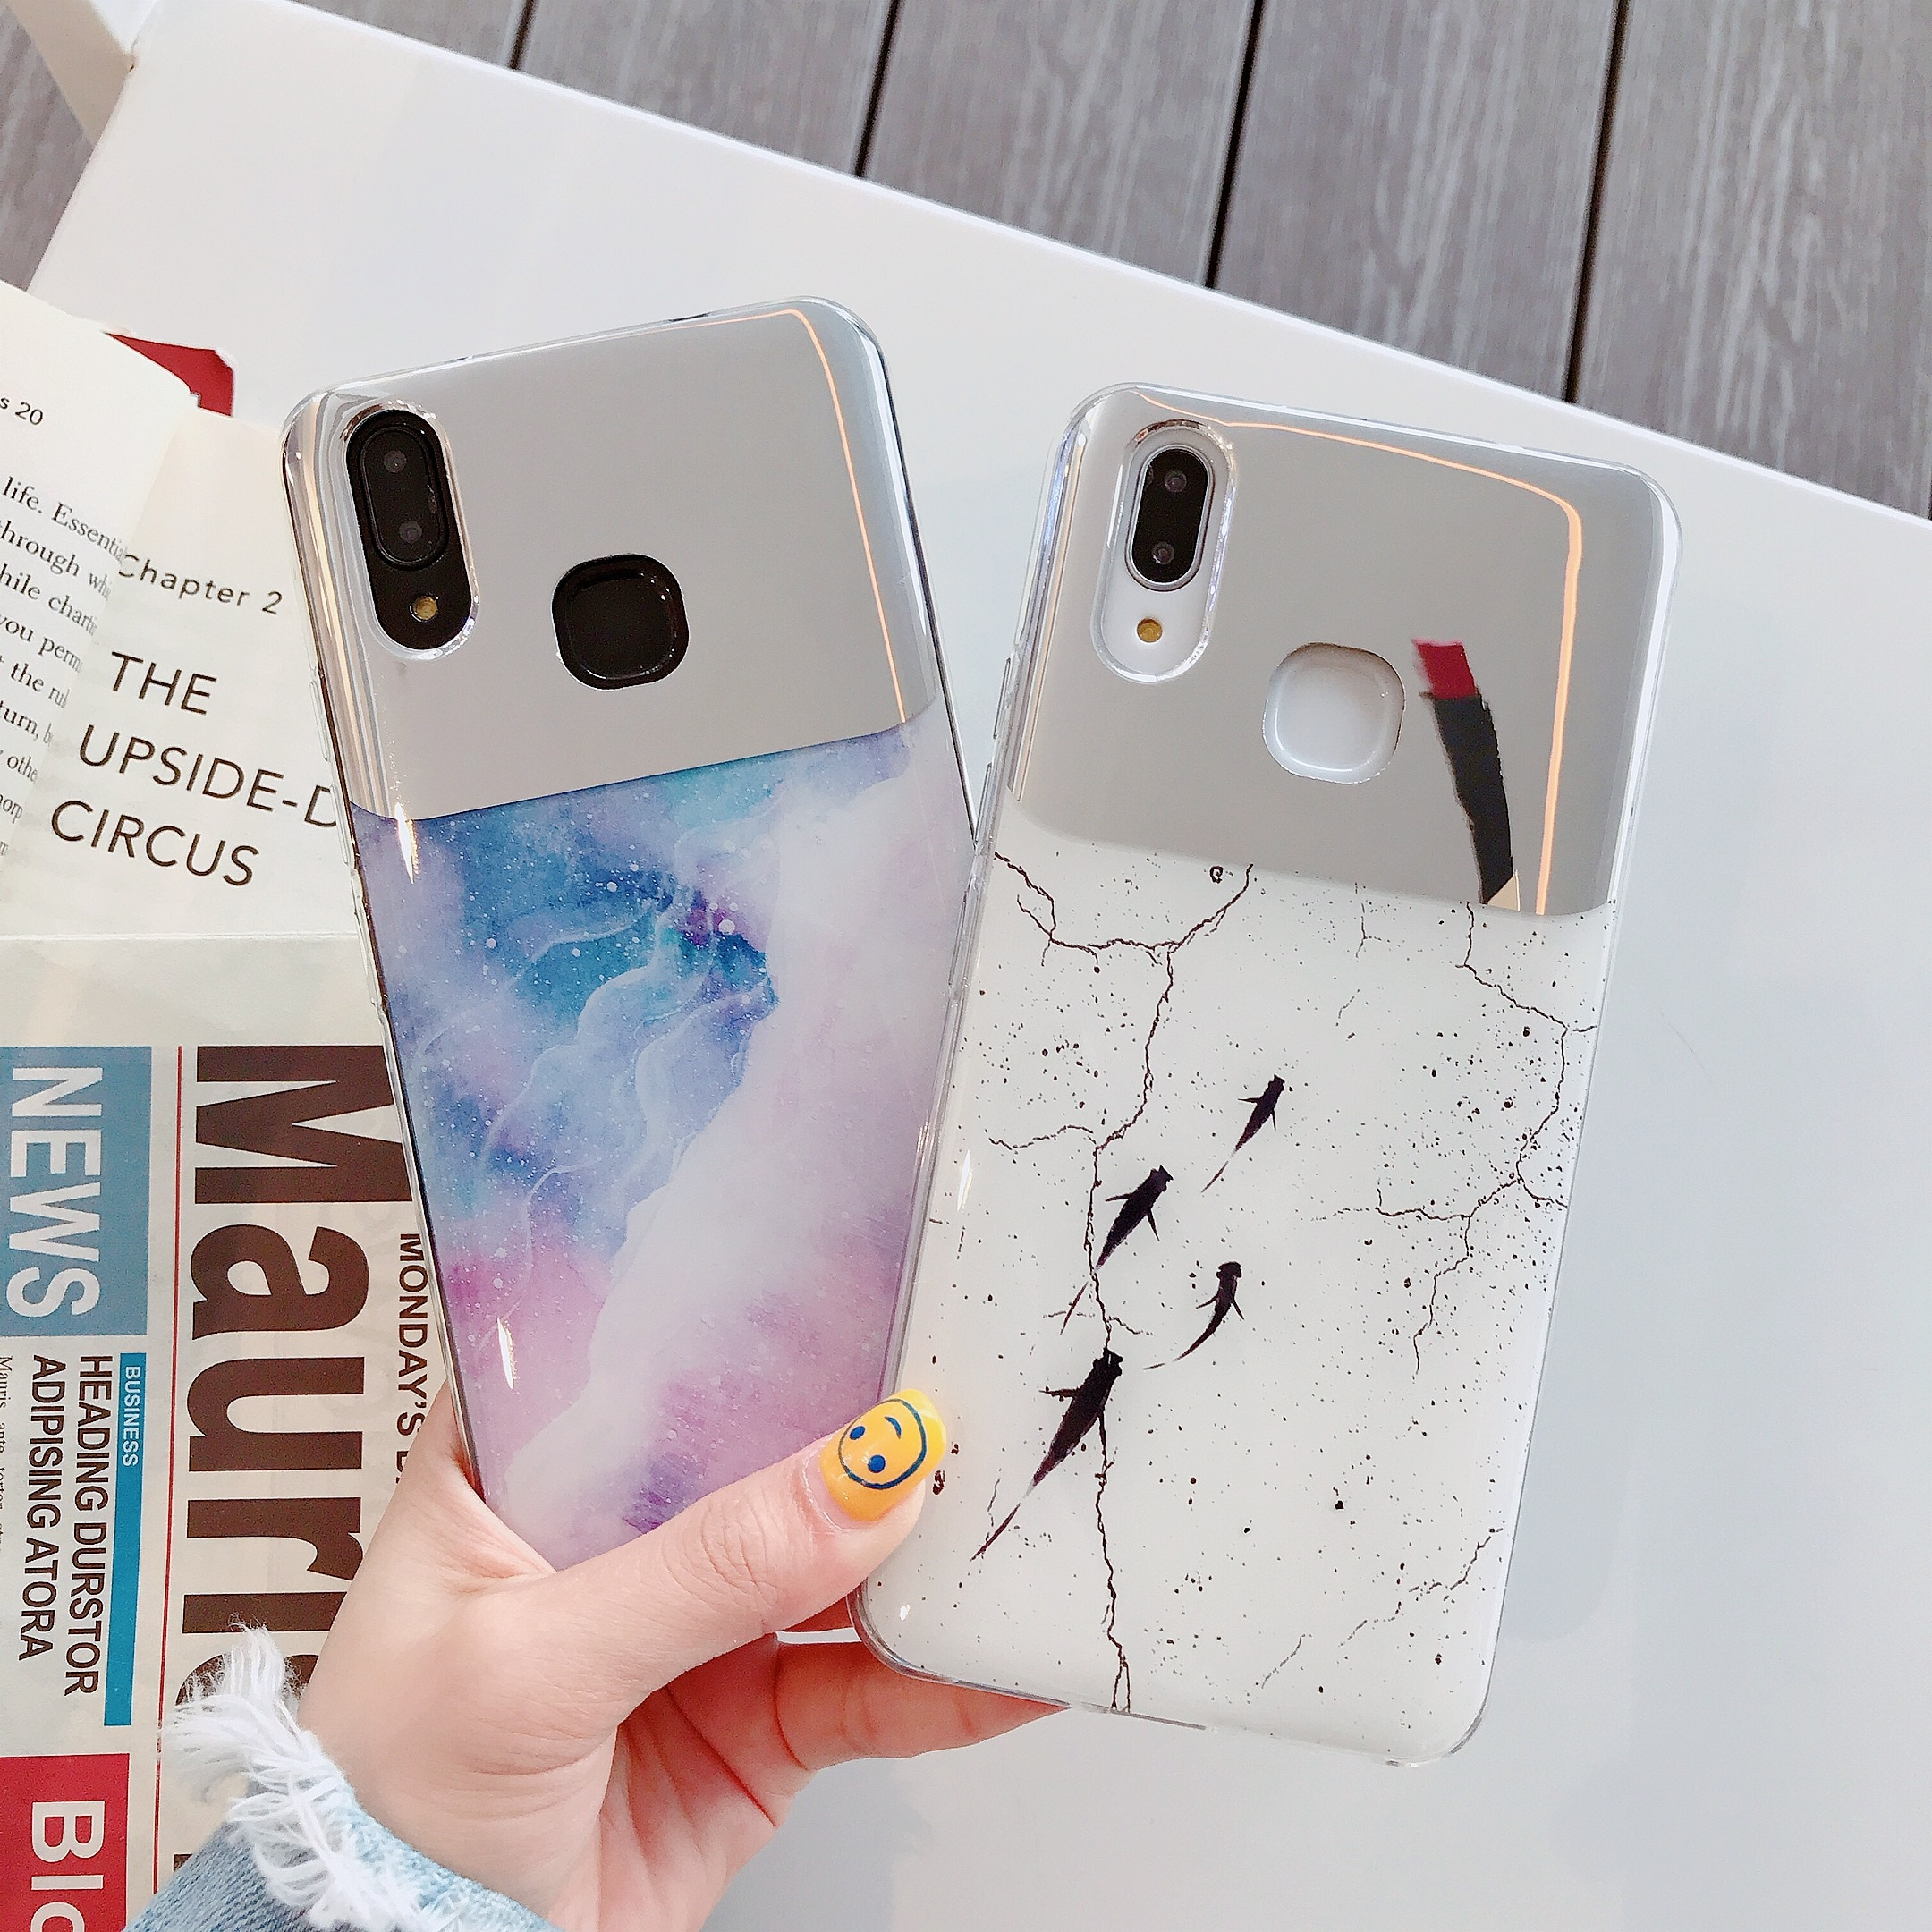 Mármol, espejo de maquillaje suave funda de teléfono para XiaoMi RedNi K20 K30 S2 ir Nota 4 4X 5 5 5 6 6 7 8 9 Pro anillo caso cordón cubierta